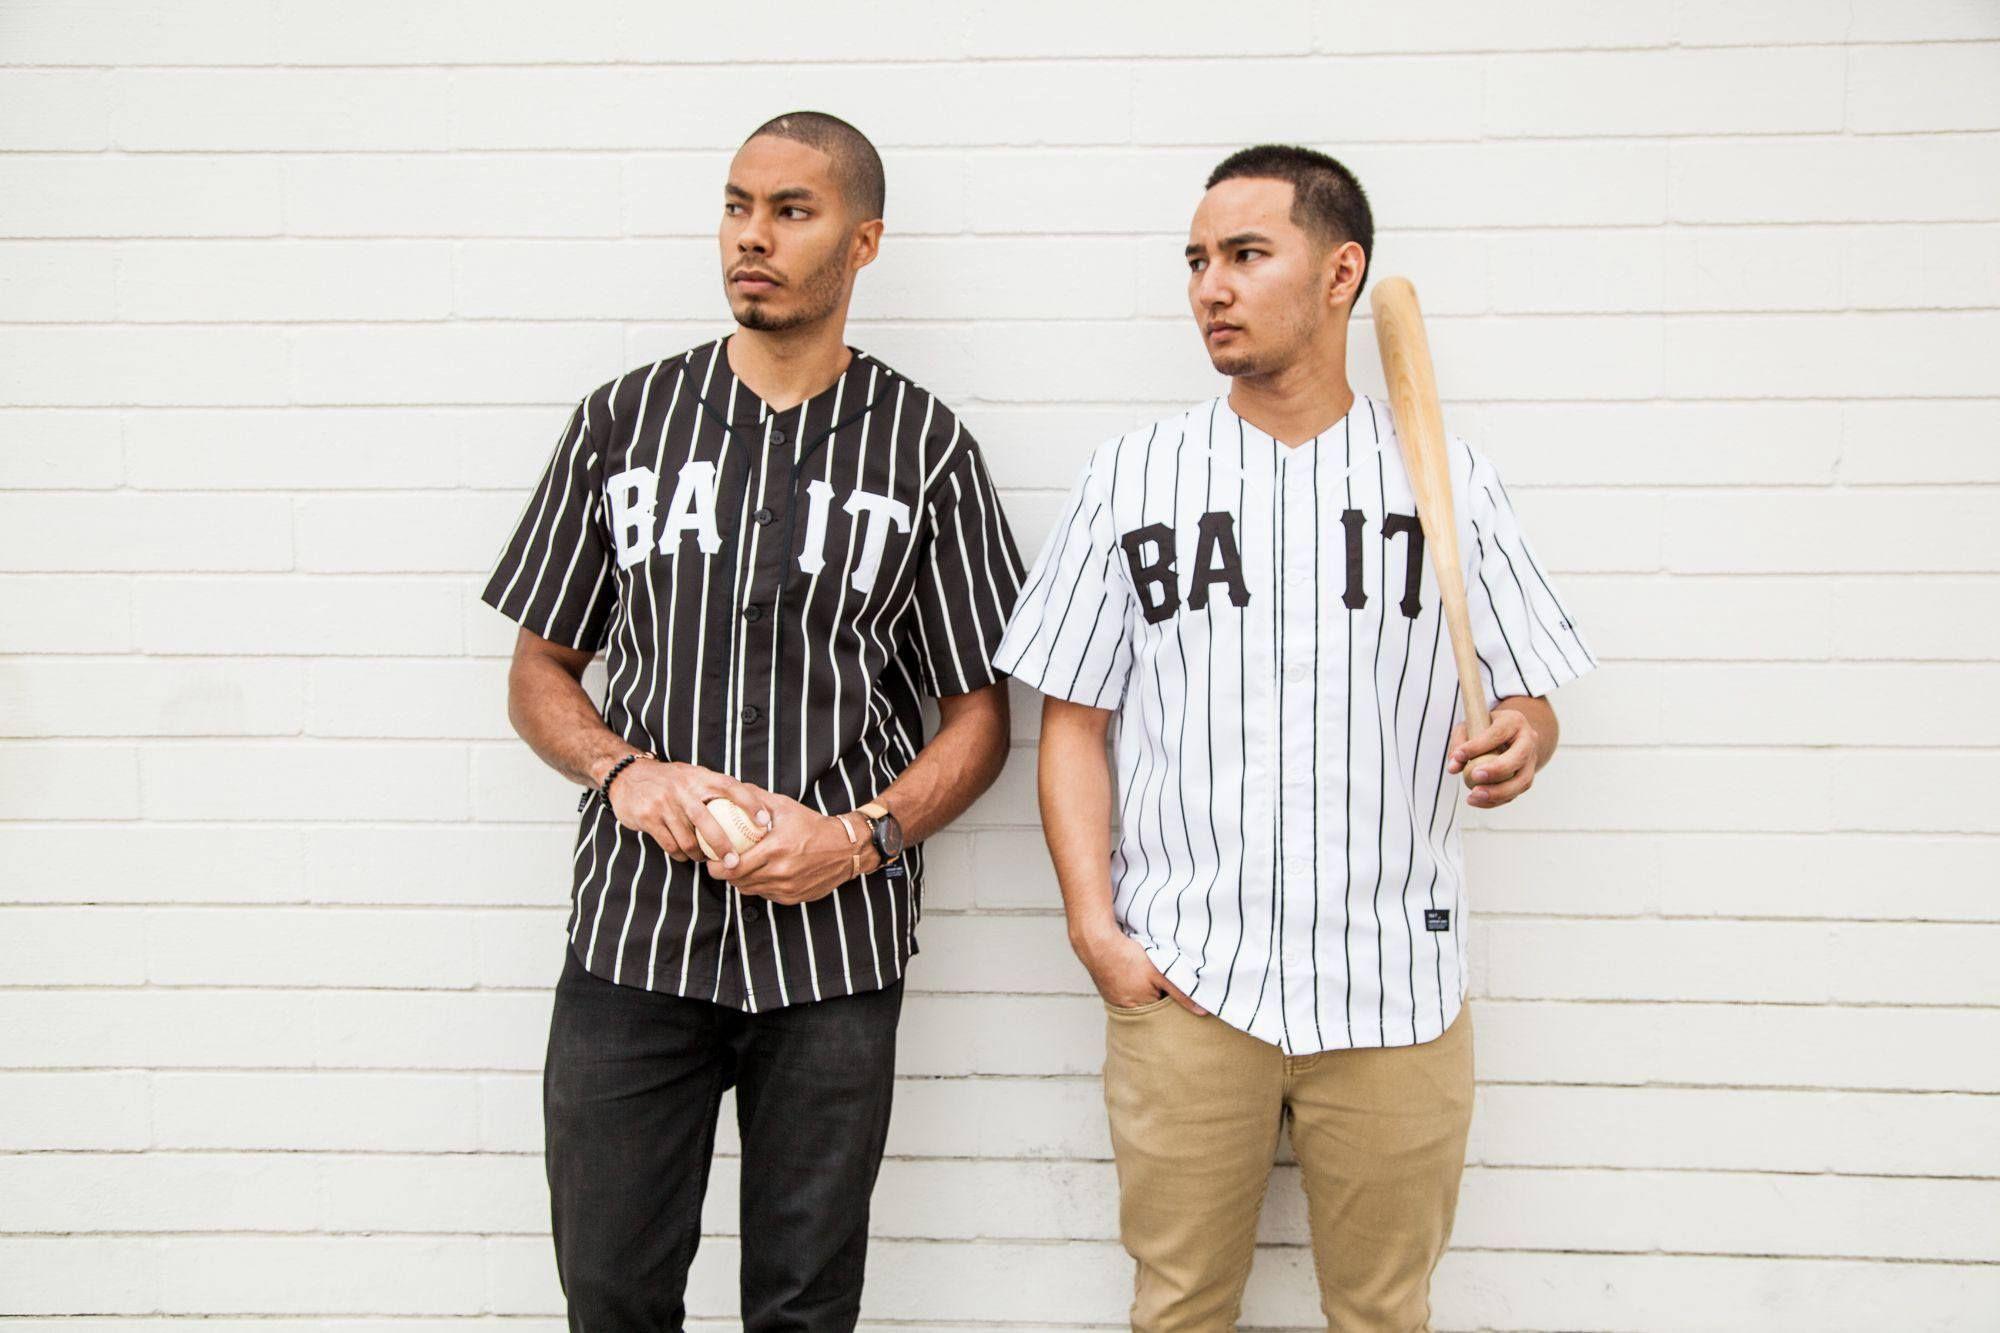 BAIT Men Sluggers Baseball Jersey black gray